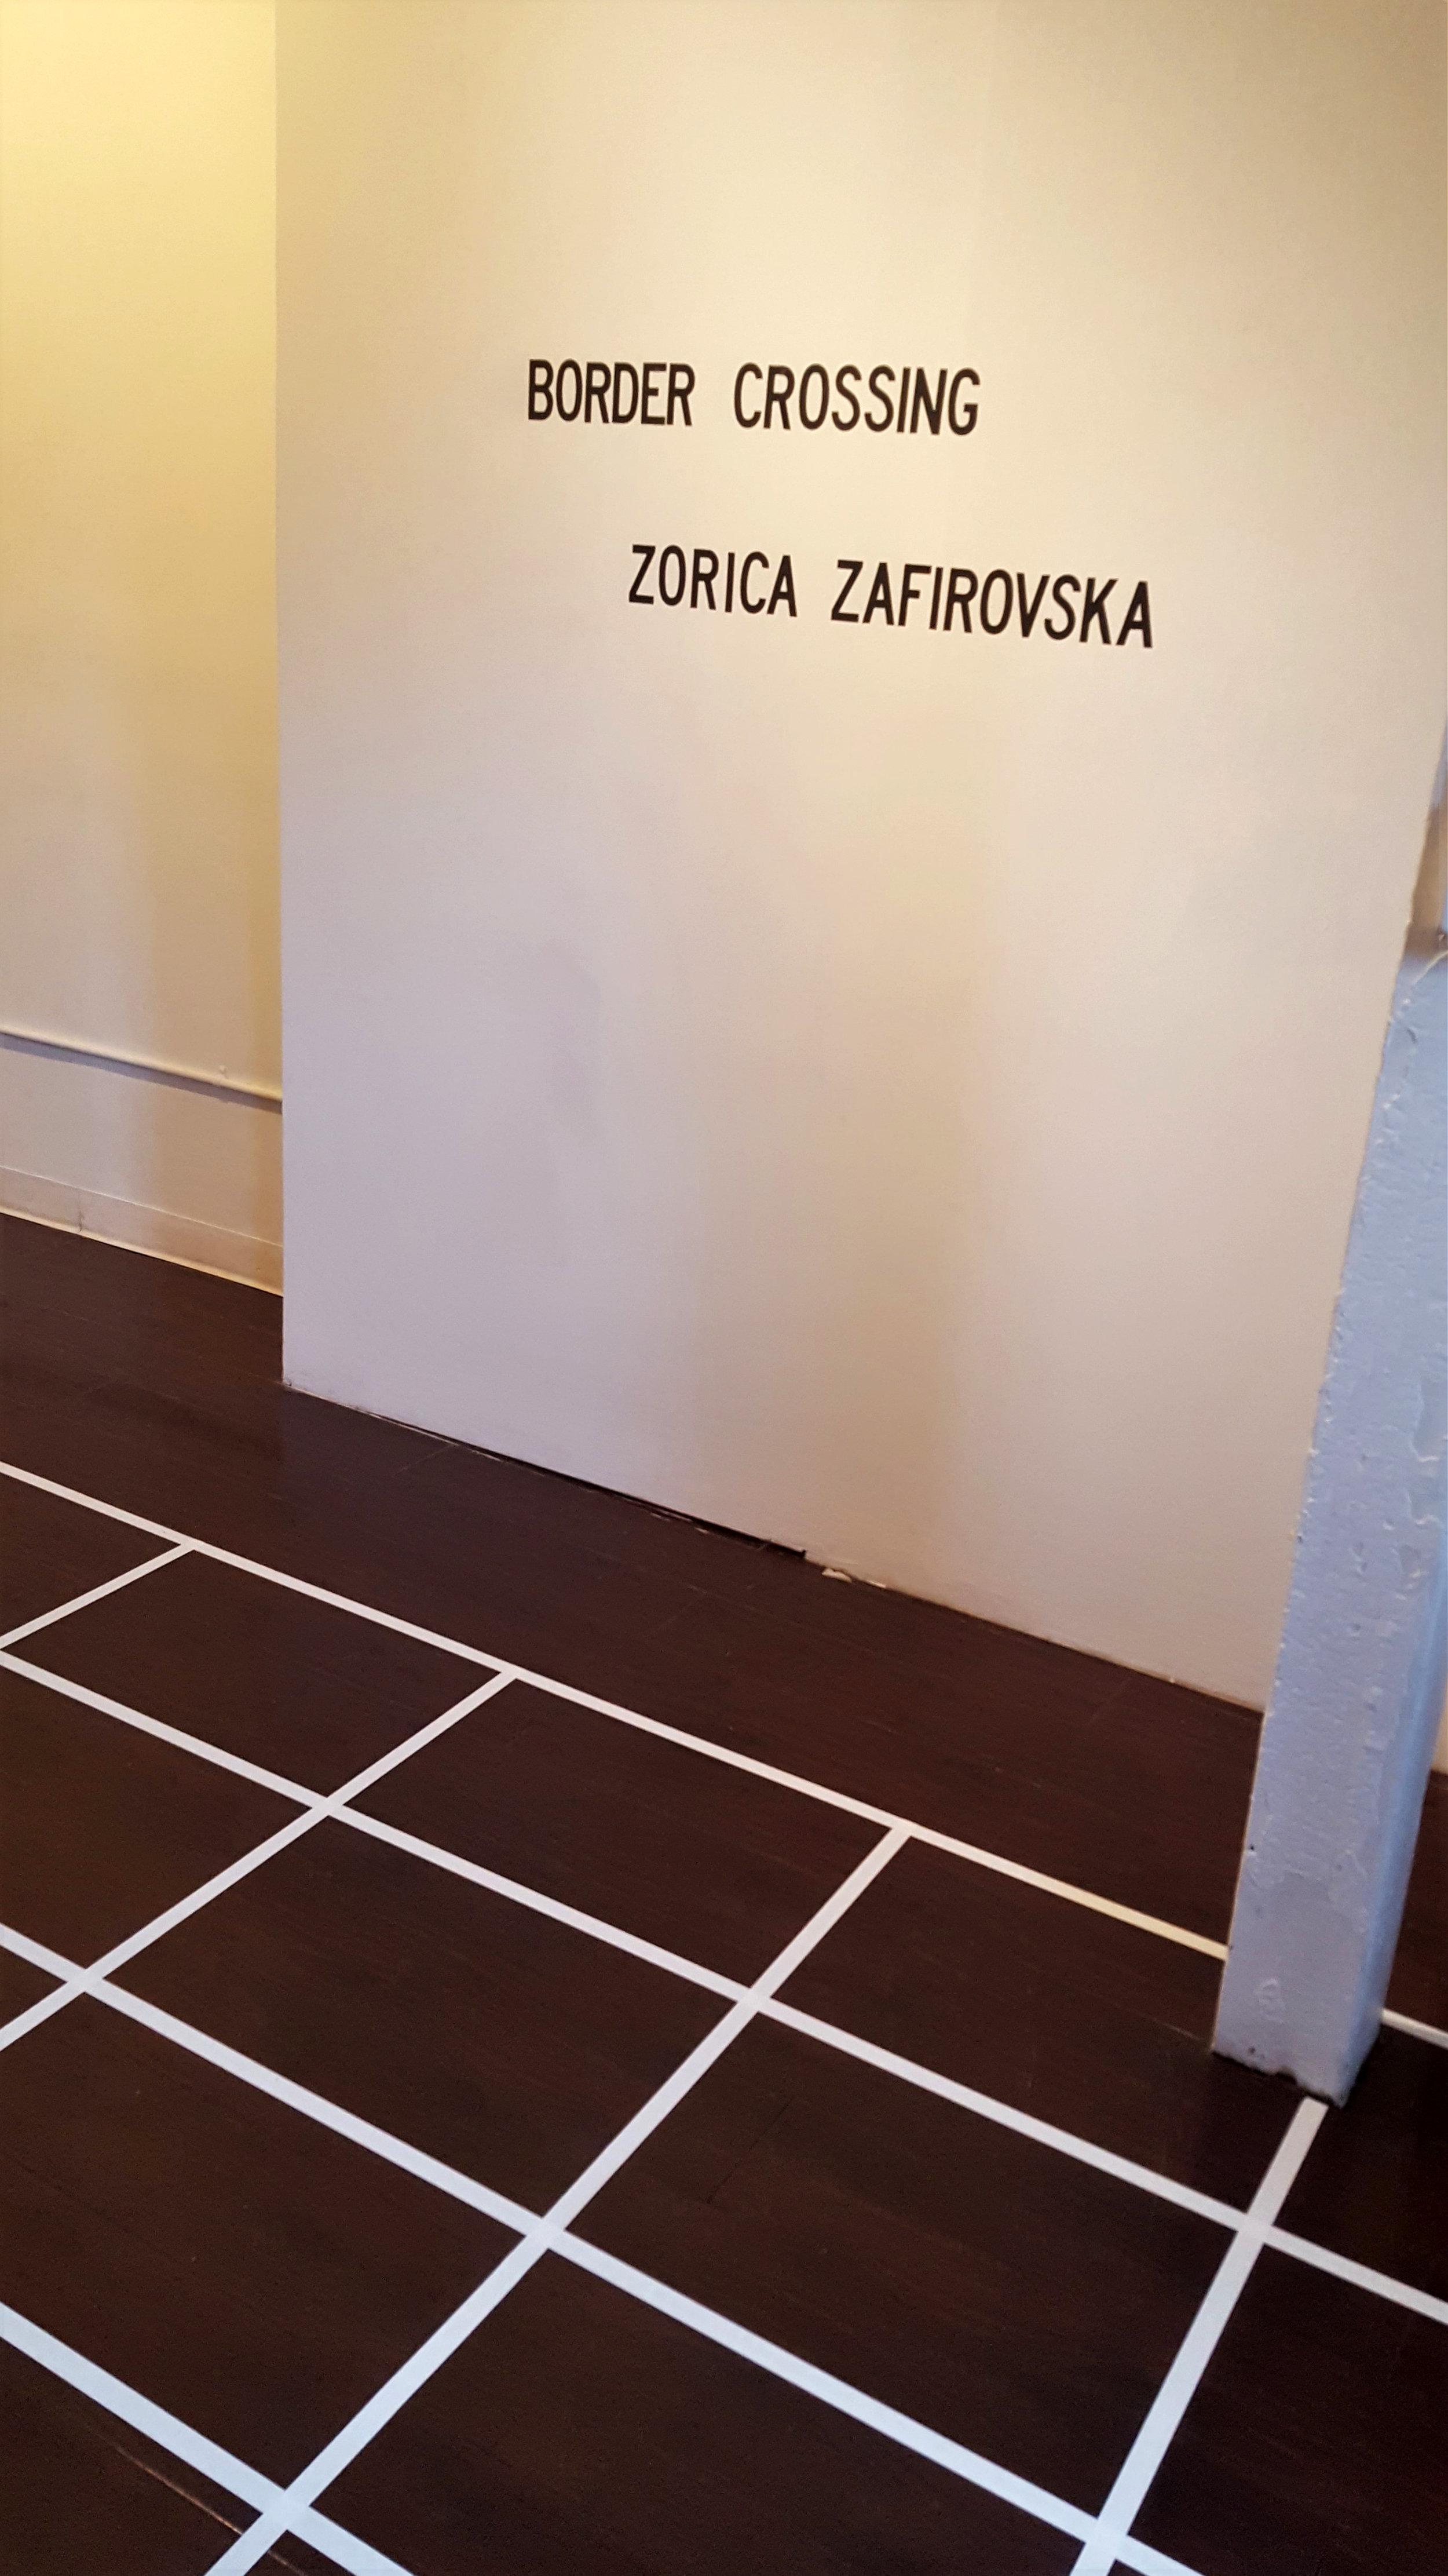 border-crossing-zorica-zafirovska_29779321036_o.jpg